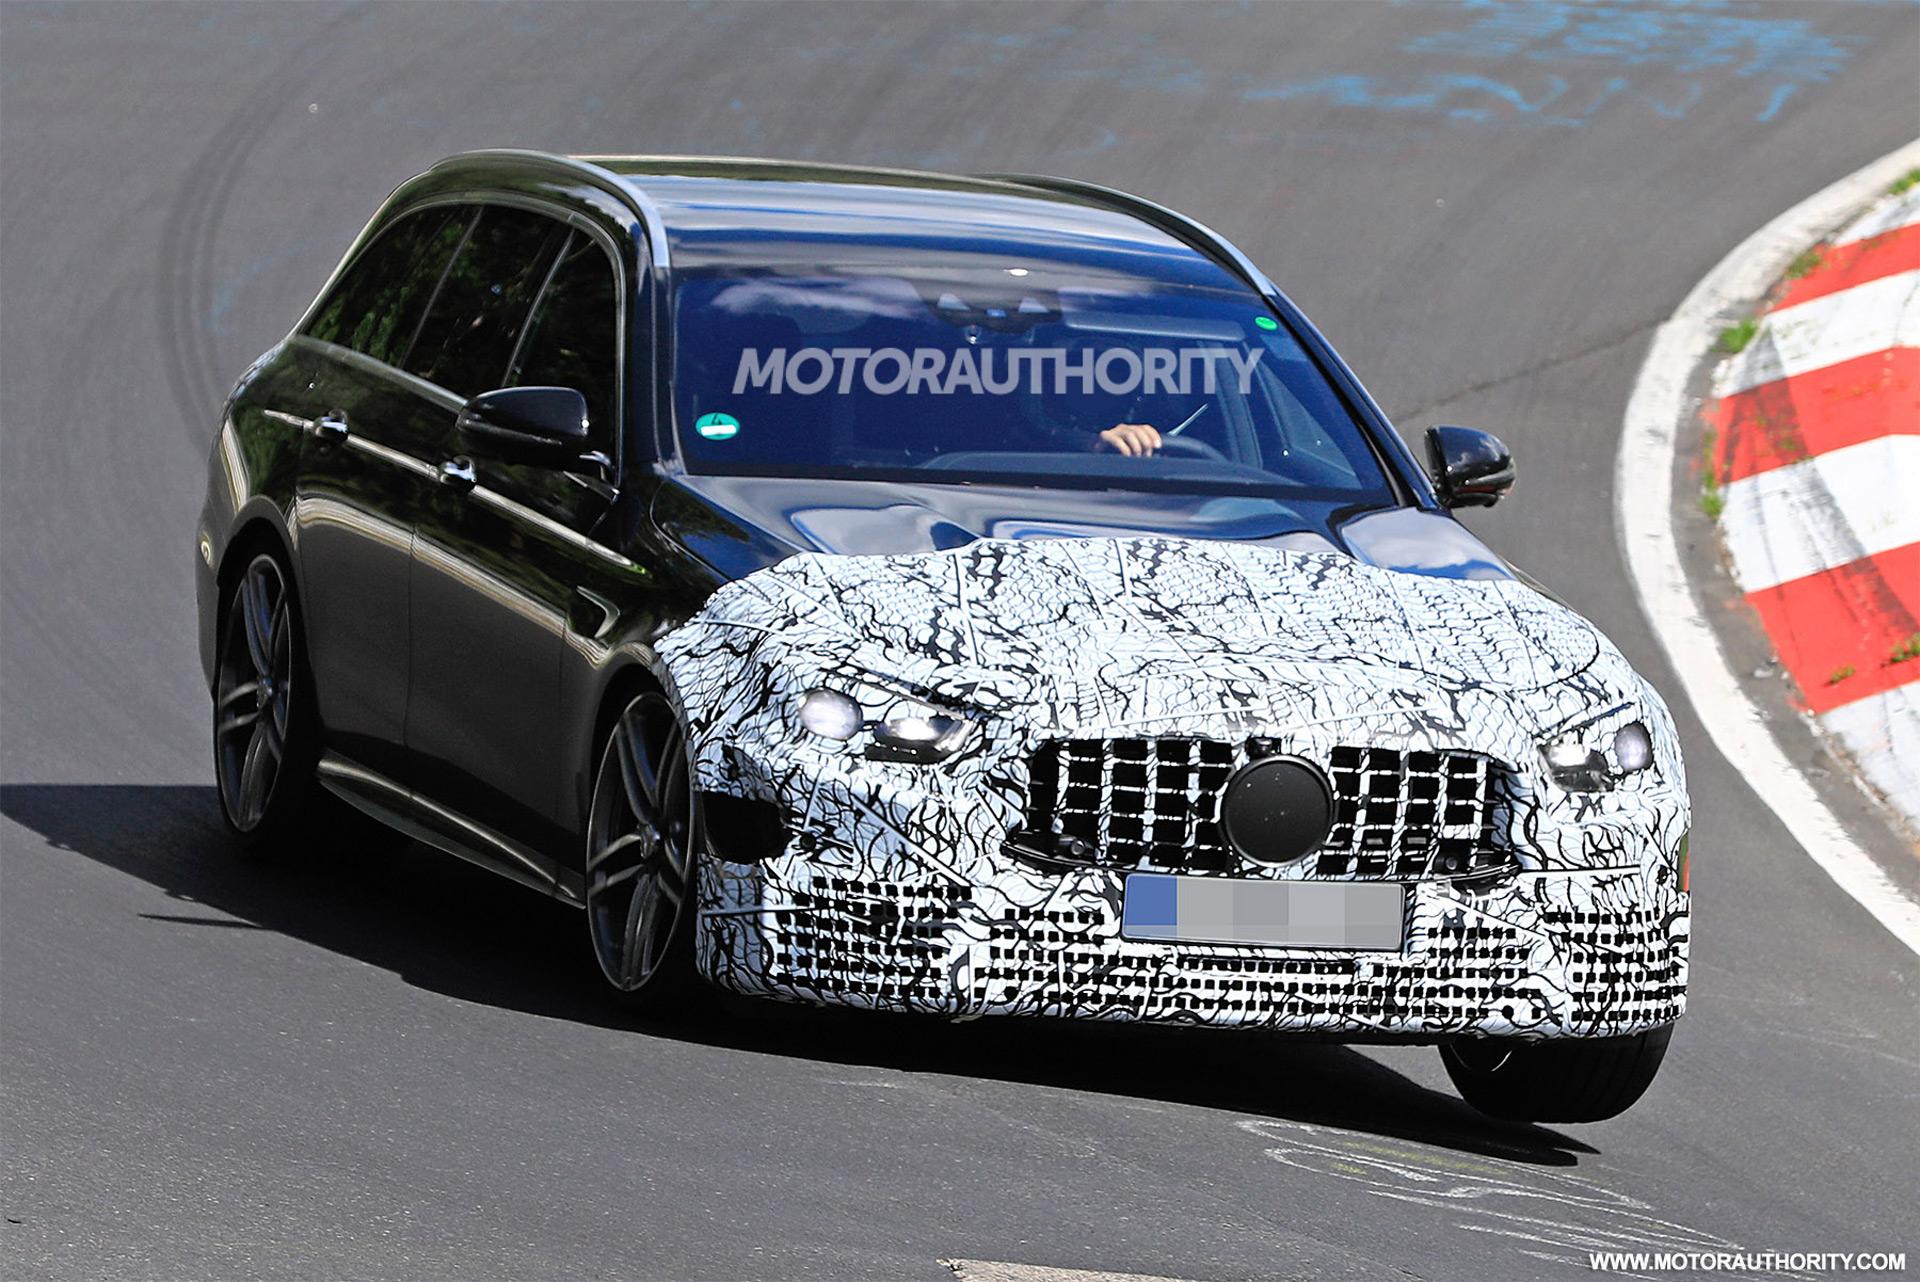 2020 - [Mercedes-Benz] Classe E restylée  - Page 2 2021-mercedes-amg-e63-wagon-facelift-spy-shots--photo-credit-s-baldauf-sb-medien_100711687_h